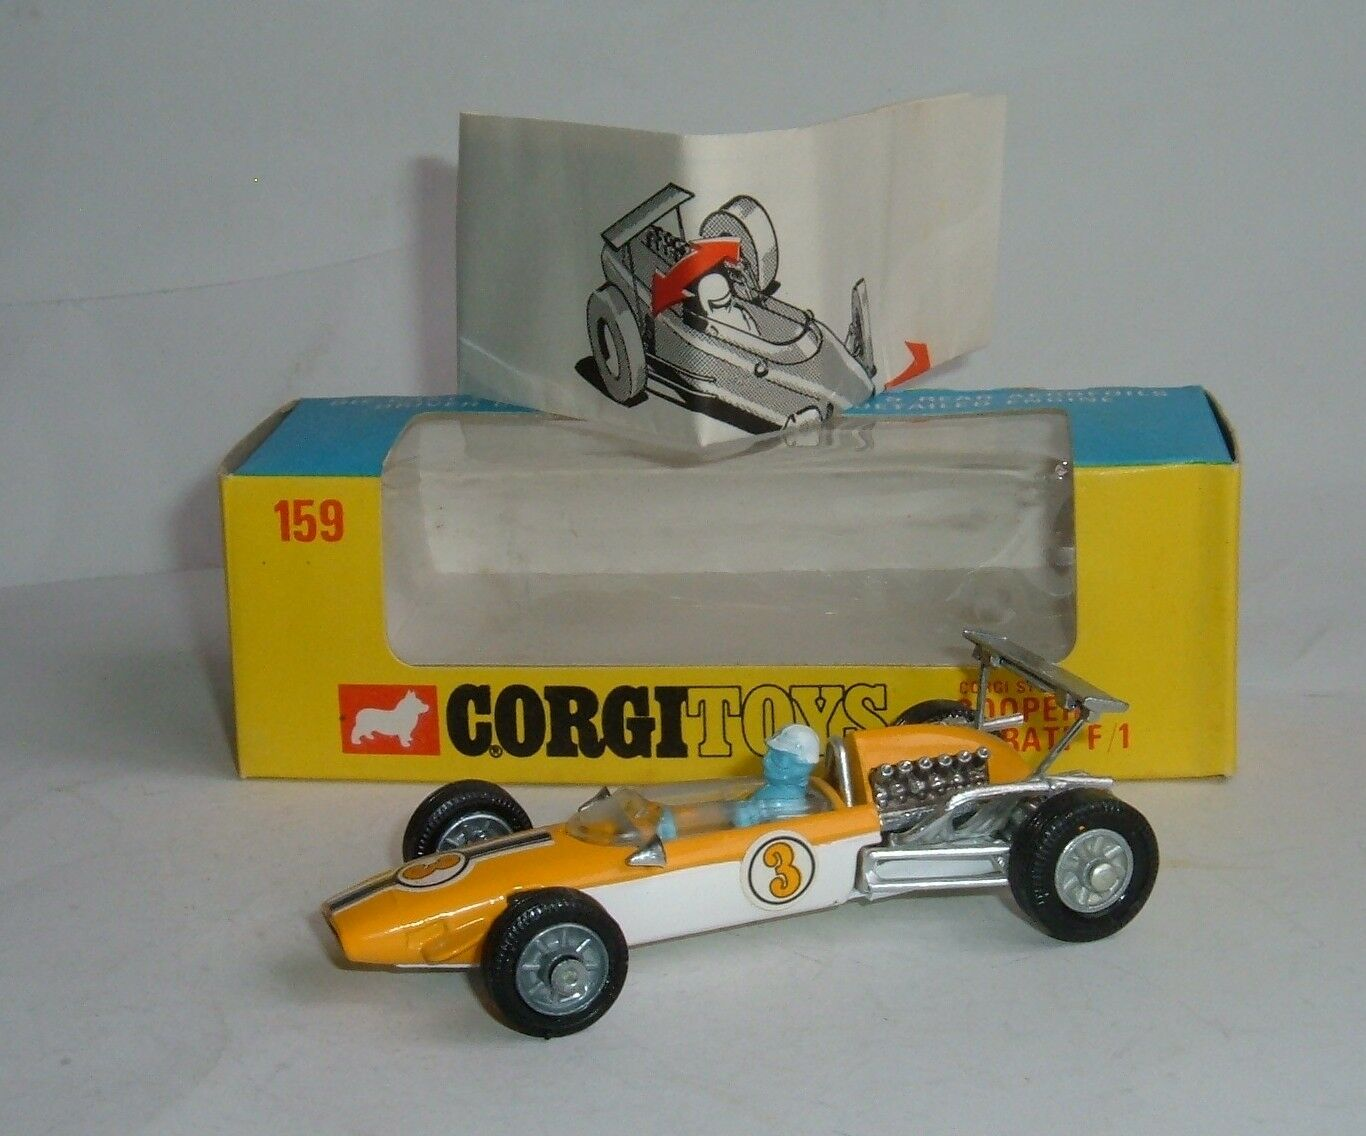 Corgi spielzeug nr. 159, cooper - maserati - f   1, ein pfefferminz.